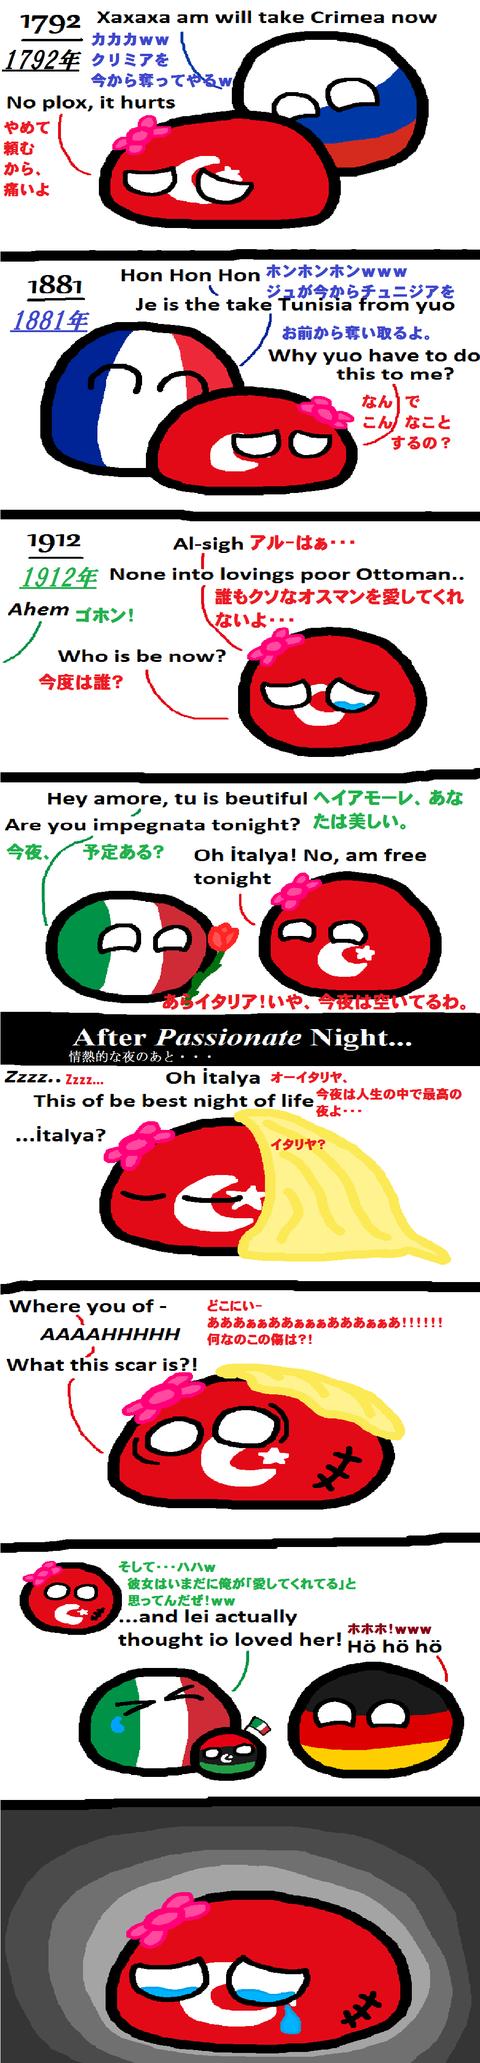 Ottoman Empire's Bad Luck in Love